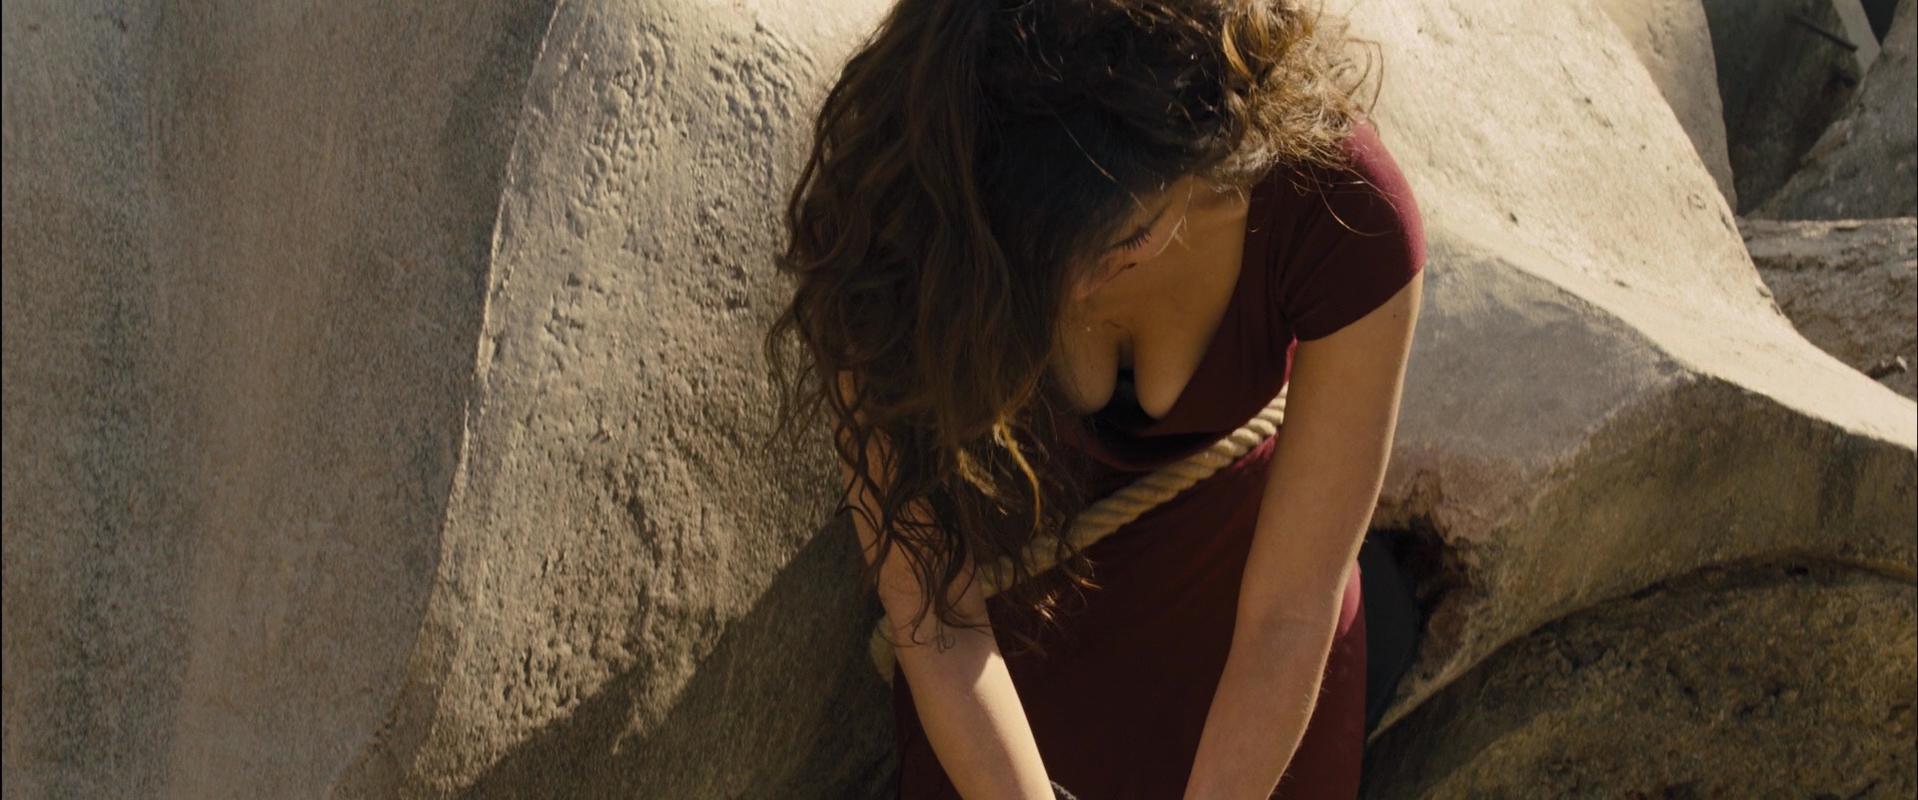 Berenice Marlohe sexy - Skyfall (2012)